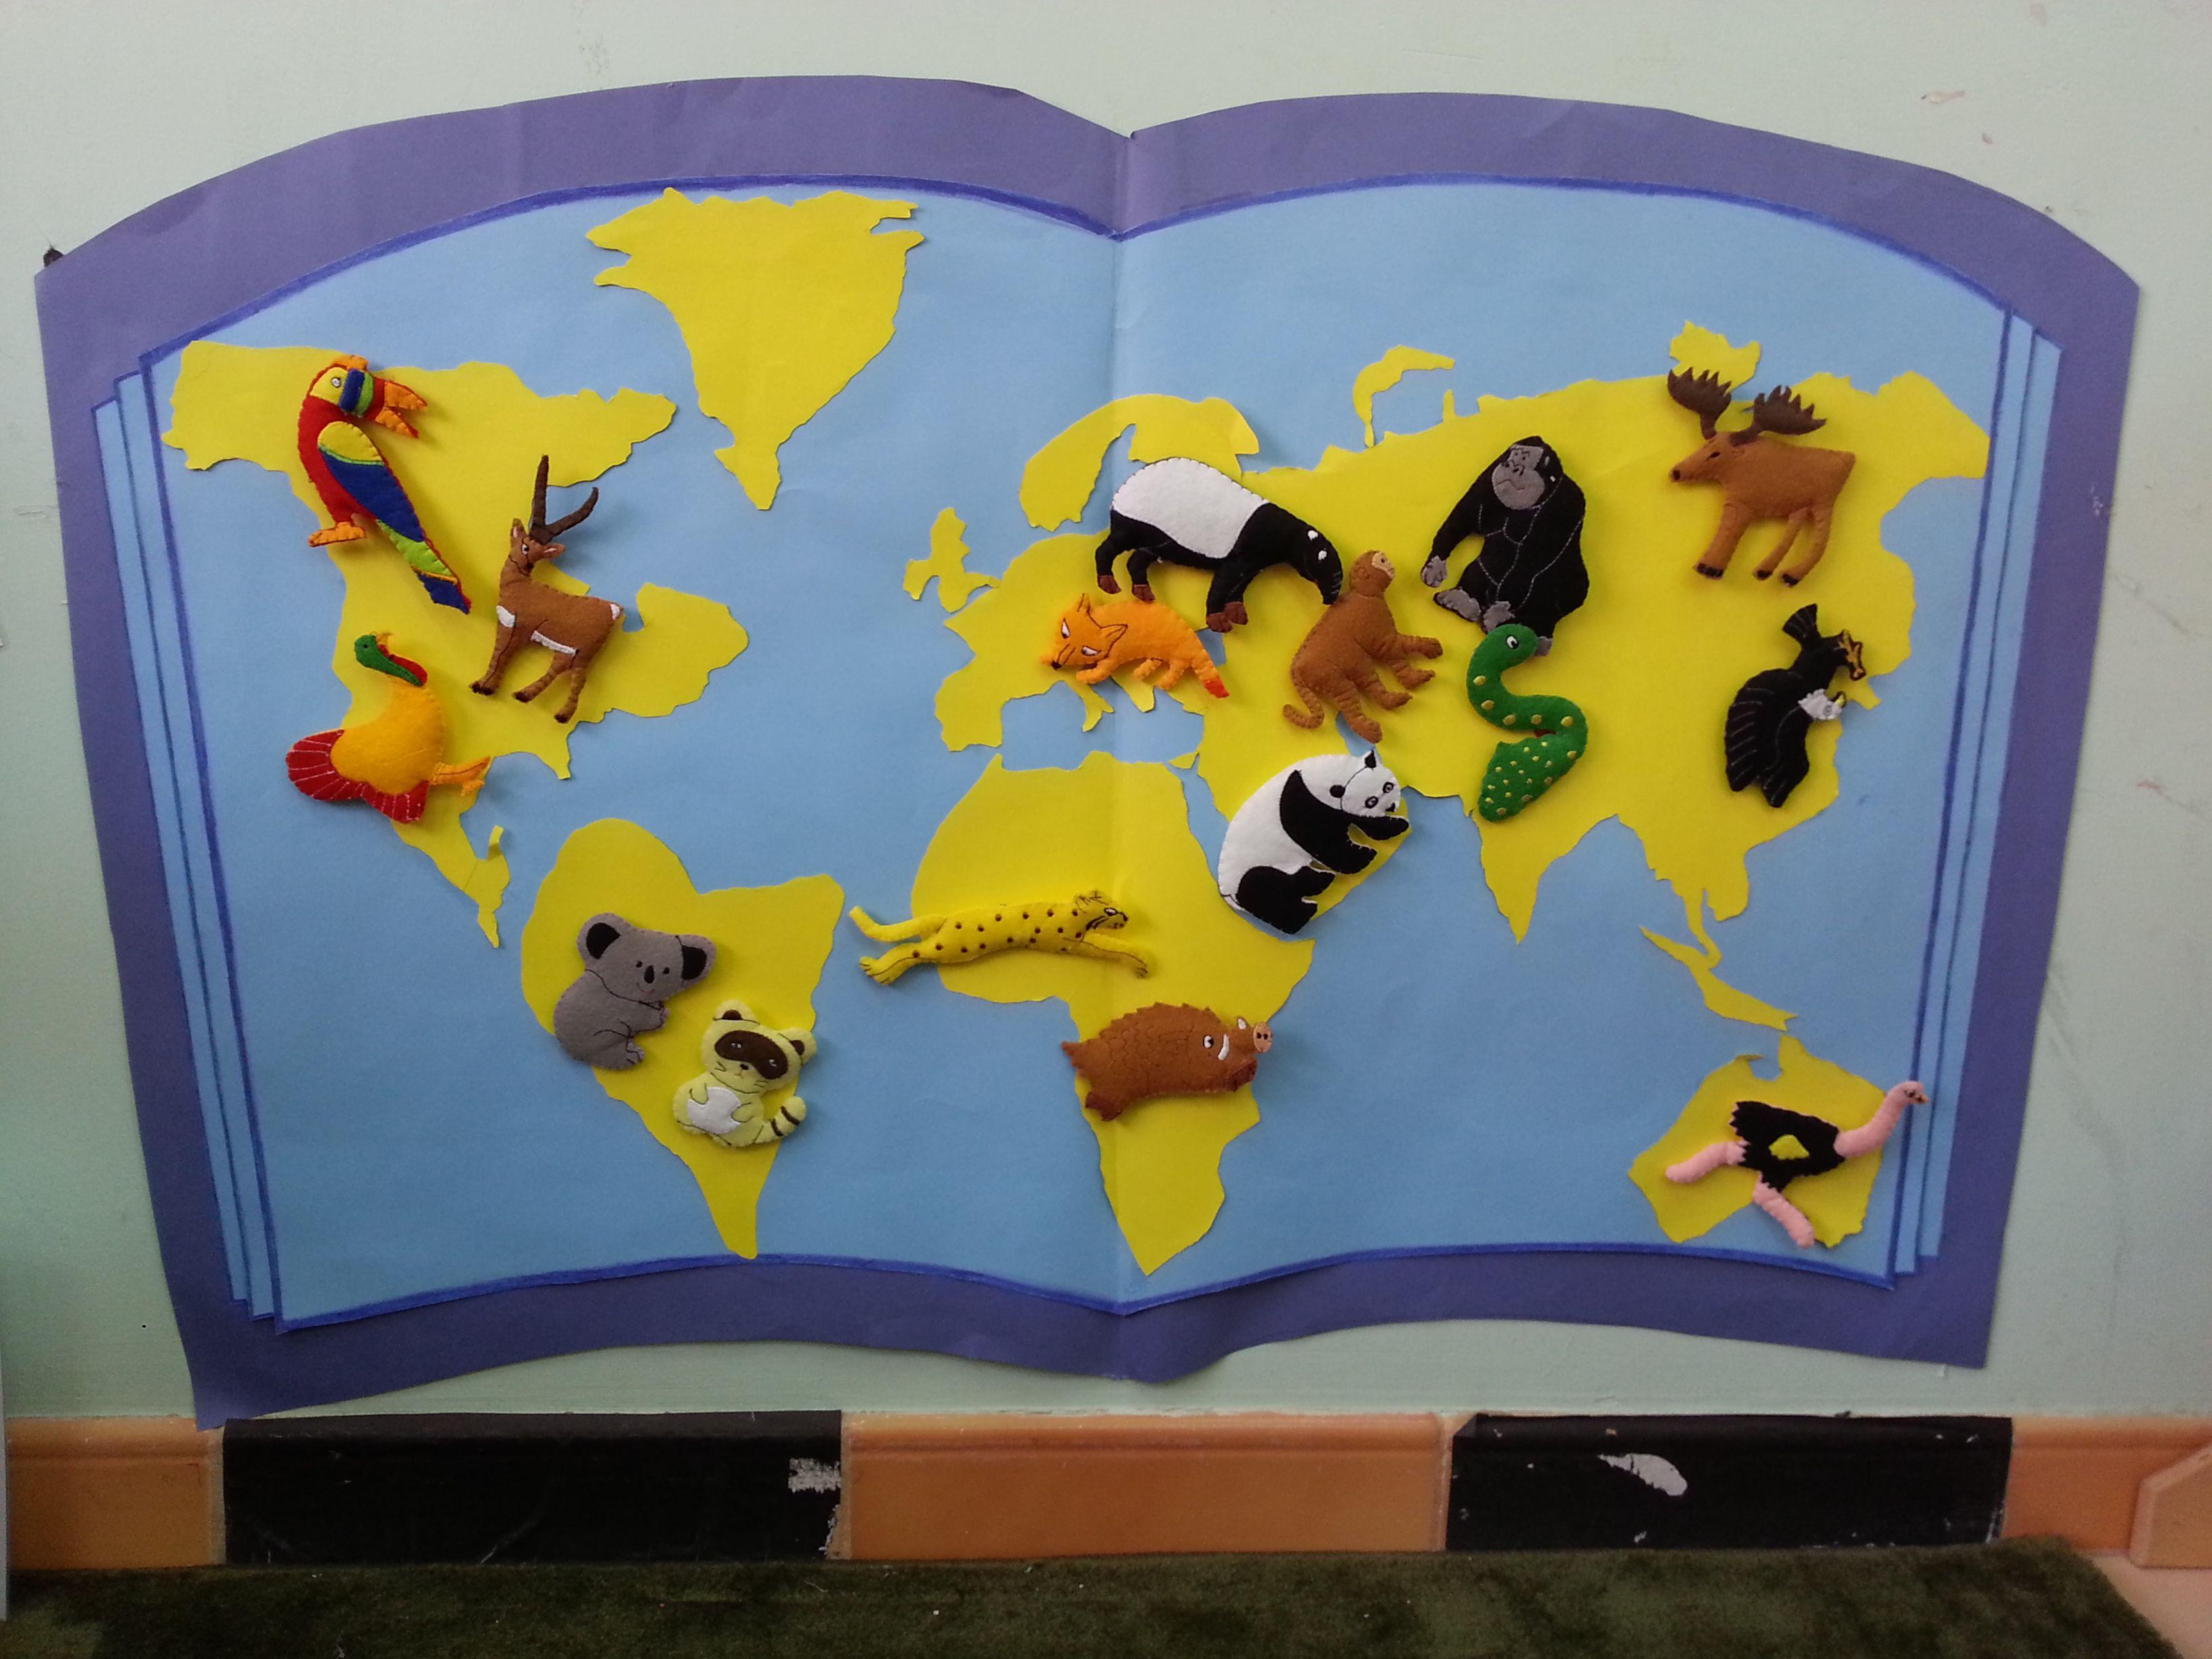 Pin By Sumayah Kawther سمية عصام كوثر On My Kg3 Classroom 2012 فصلي في التدريب الميداني Country Flags Eu Flag Flag